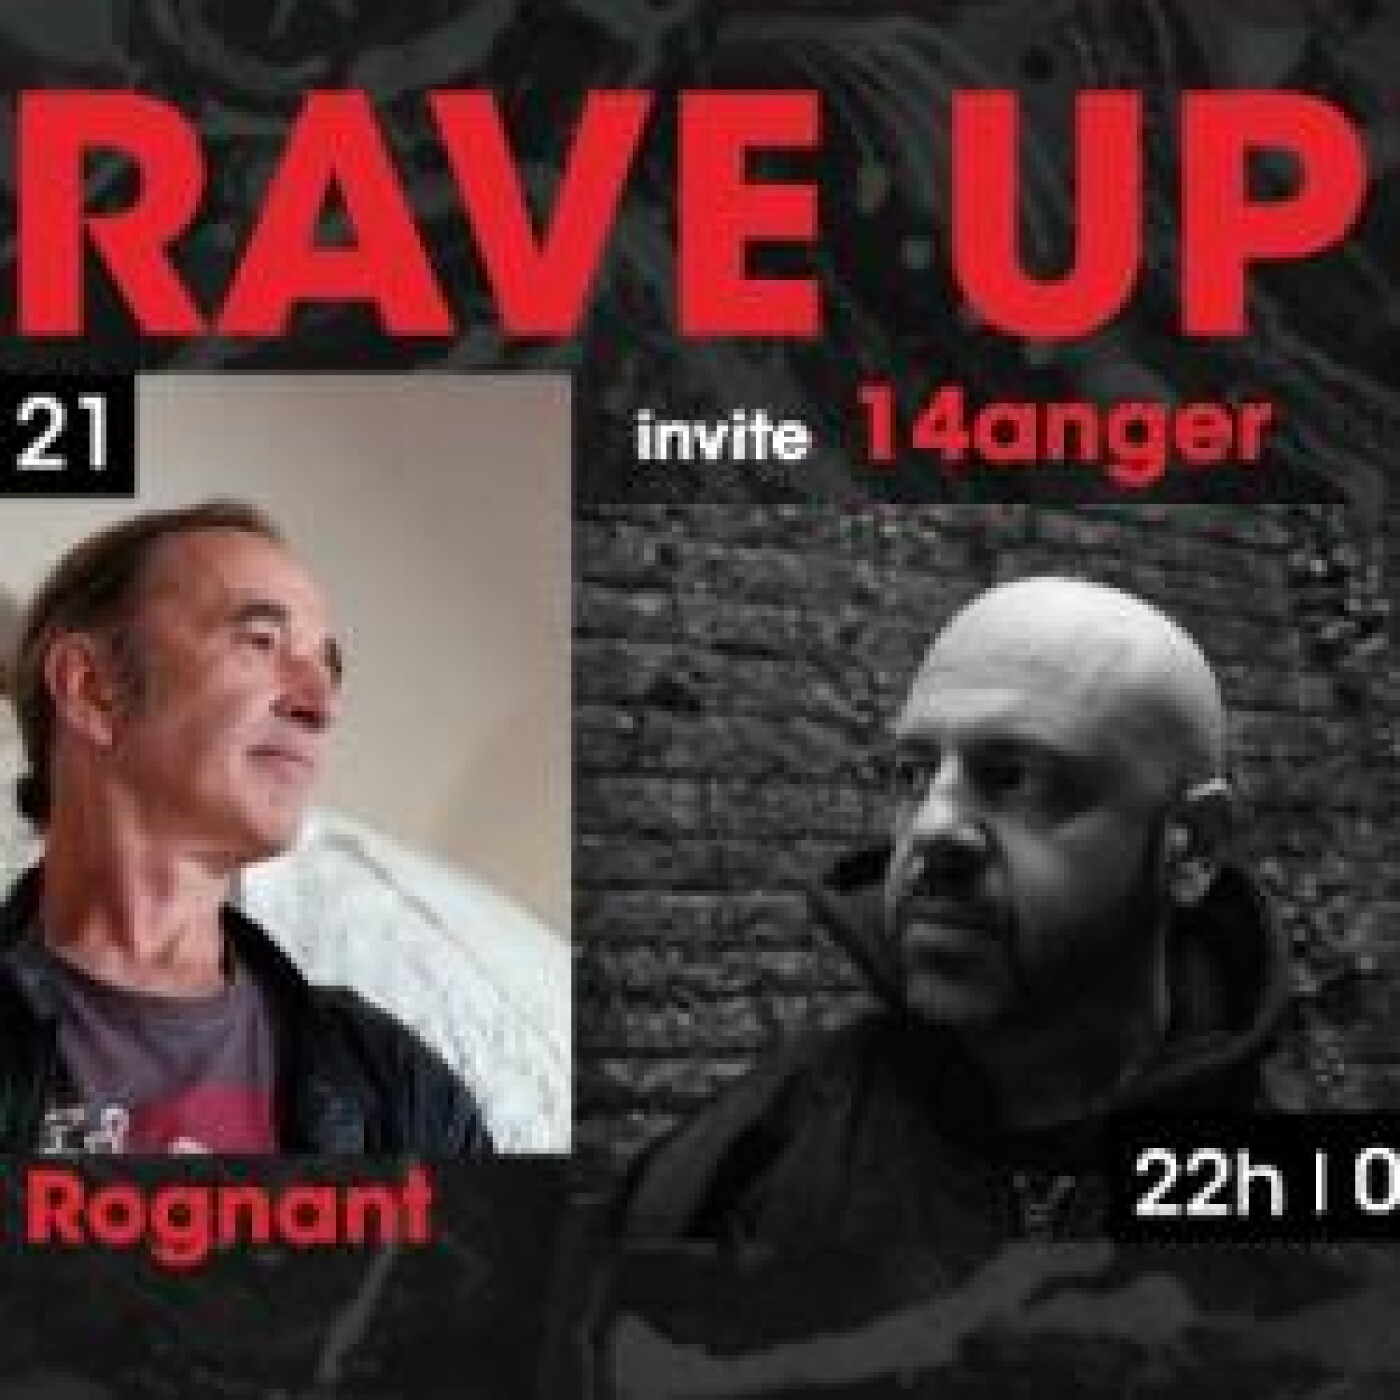 RAVE UP : 14anger